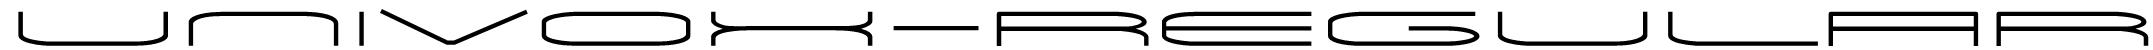 Univox-Regular Font